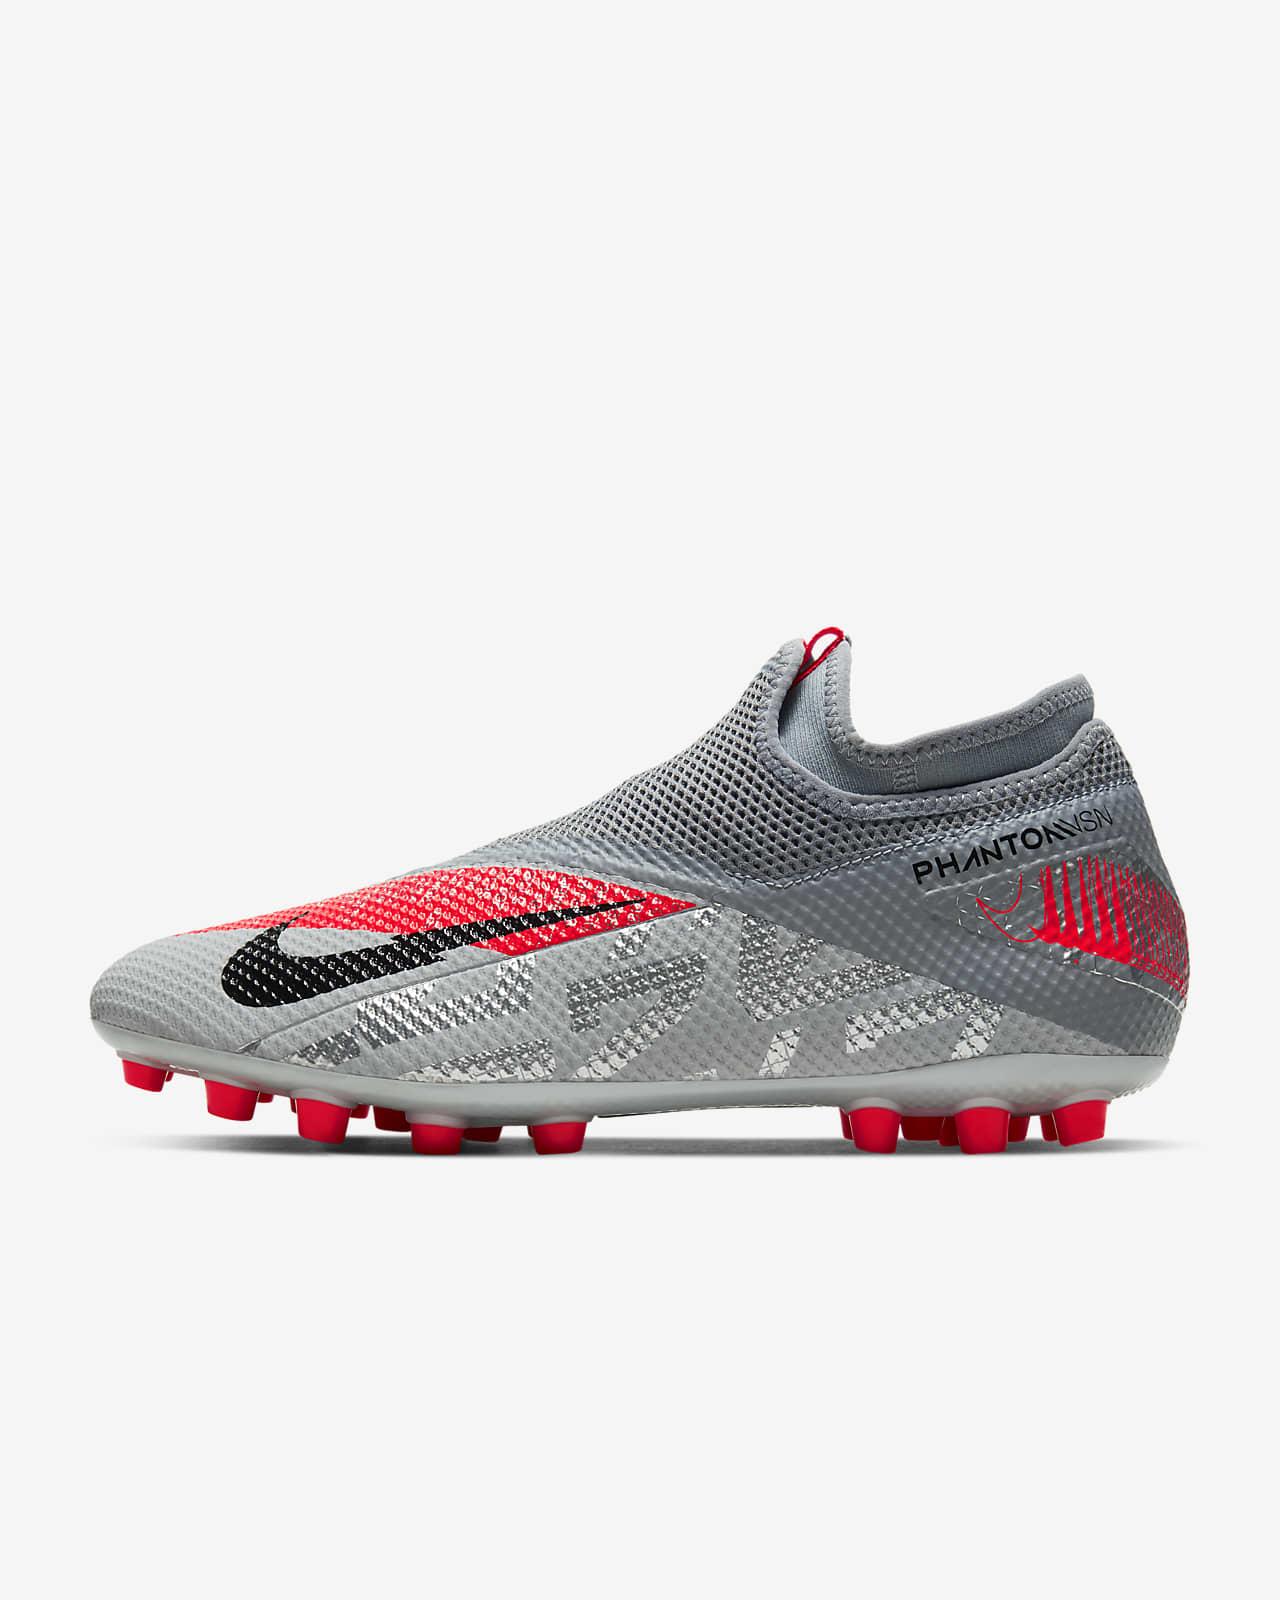 Nike Phantom Vision 2 Academy Dynamic Fit AG Voetbalschoen (kunstgras)